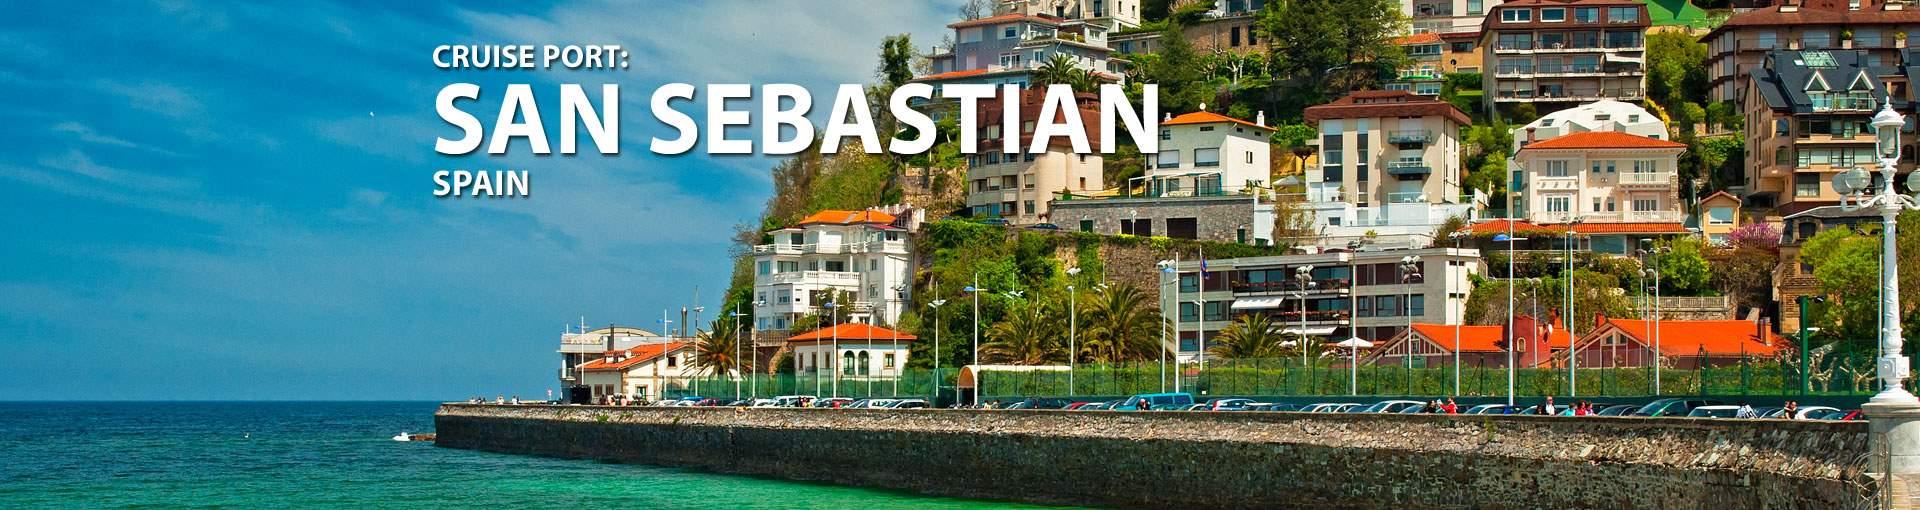 Cruises to San Sebastian, Spain